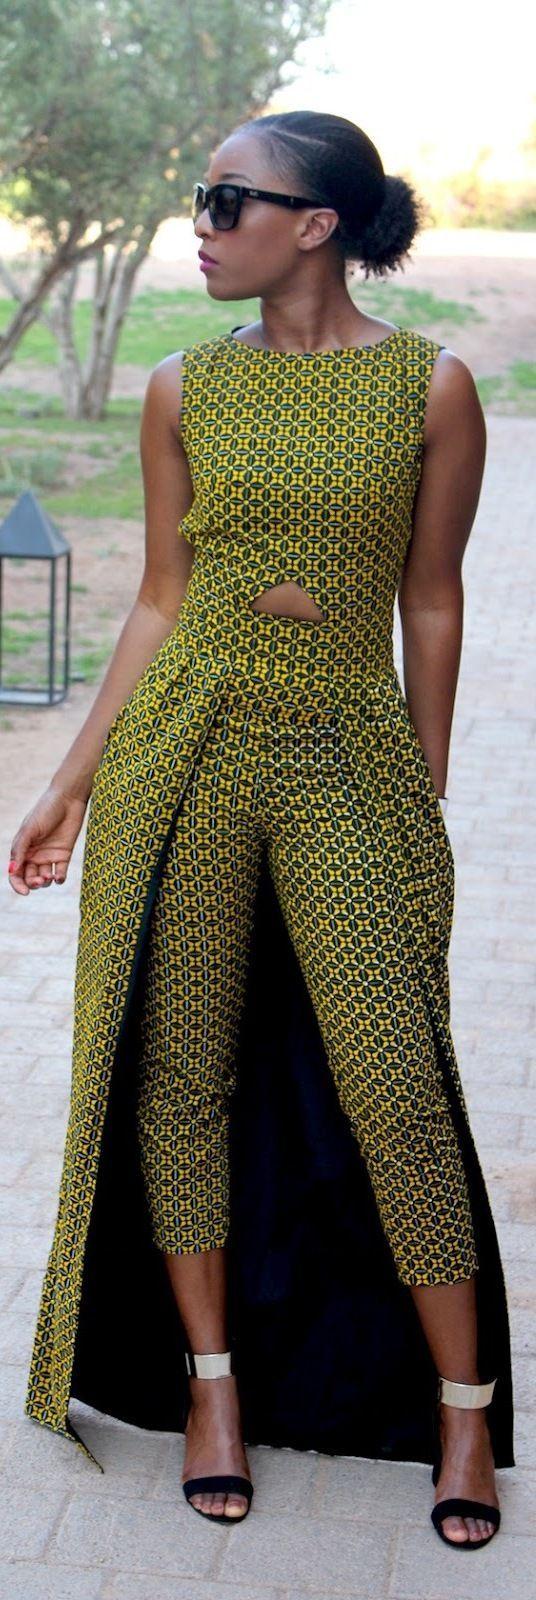 Natacha Baco / Fashion By M'bem Di Fora                                     ...